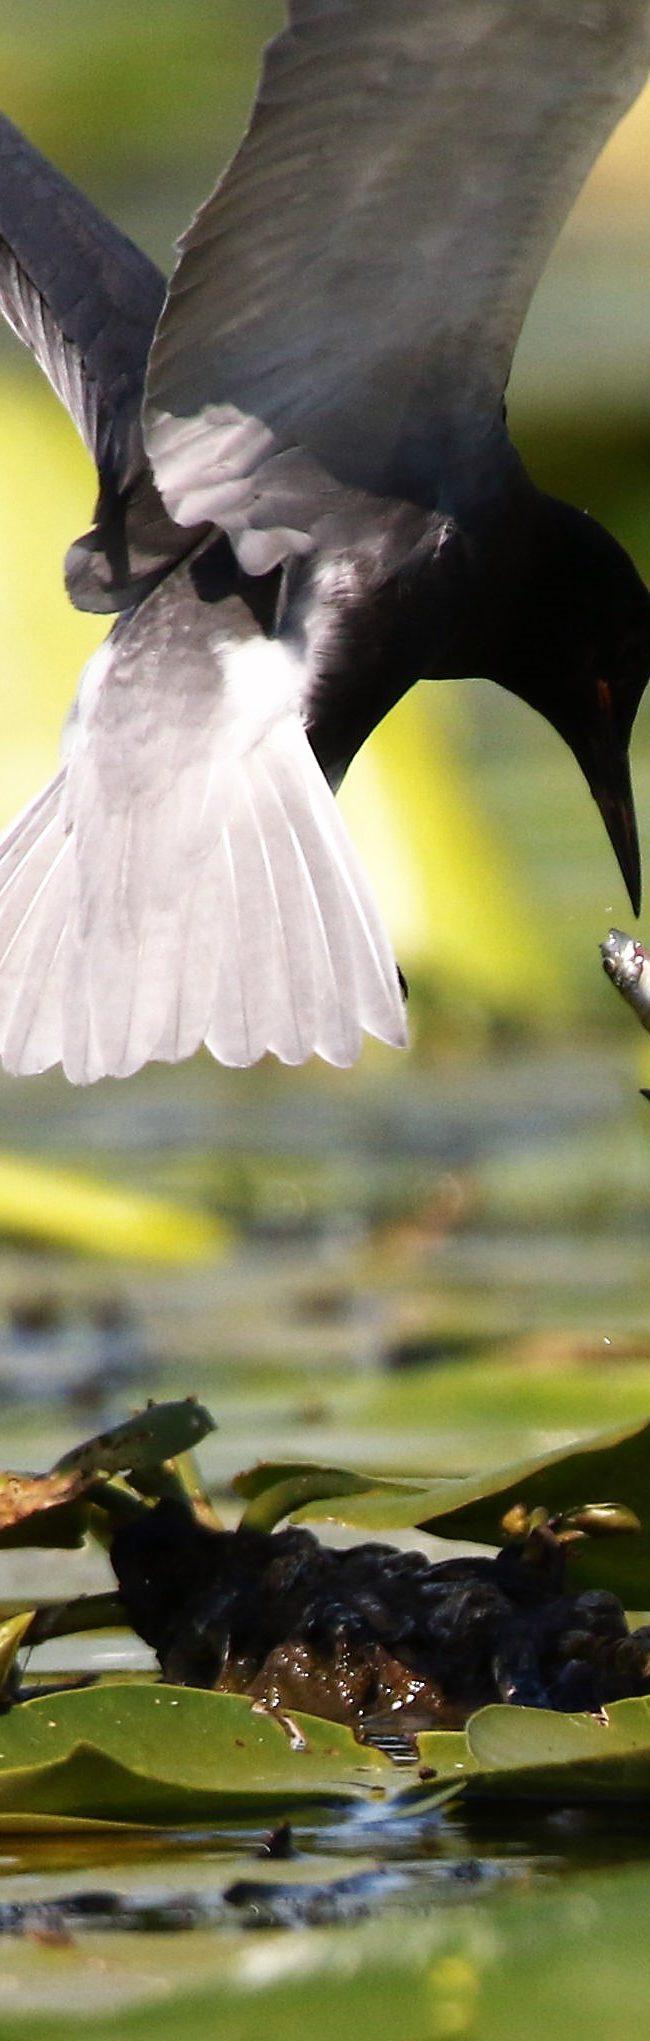 Zwarte stern (chlidonias niger)